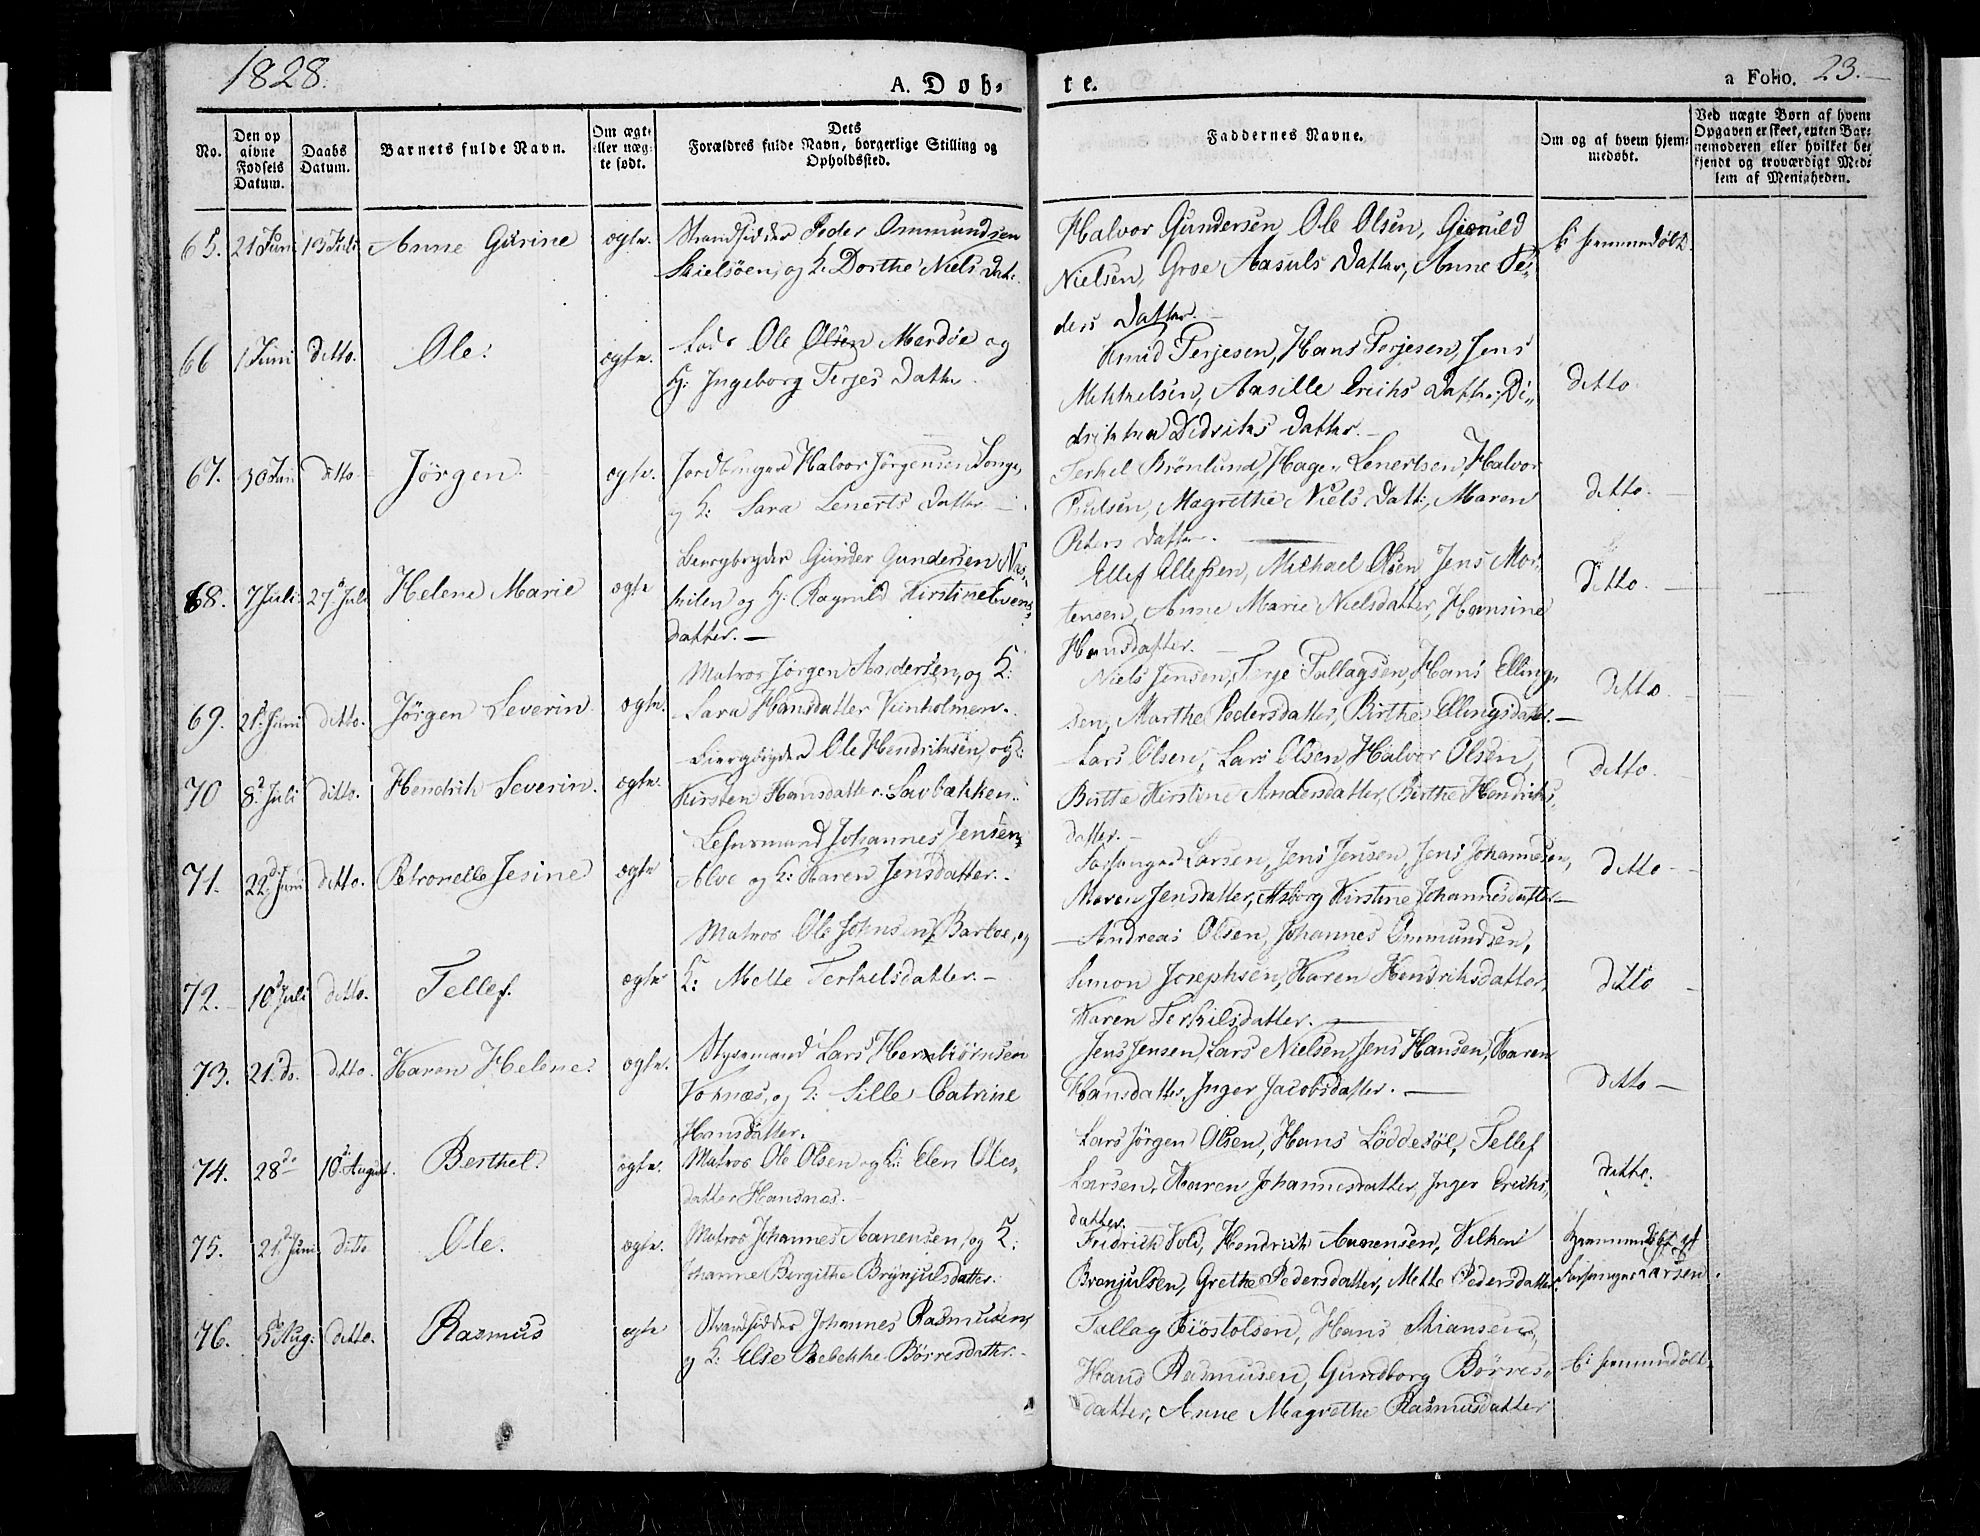 SAK, Tromøy sokneprestkontor, F/Fa/L0003: Ministerialbok nr. A 3, 1825-1837, s. 23